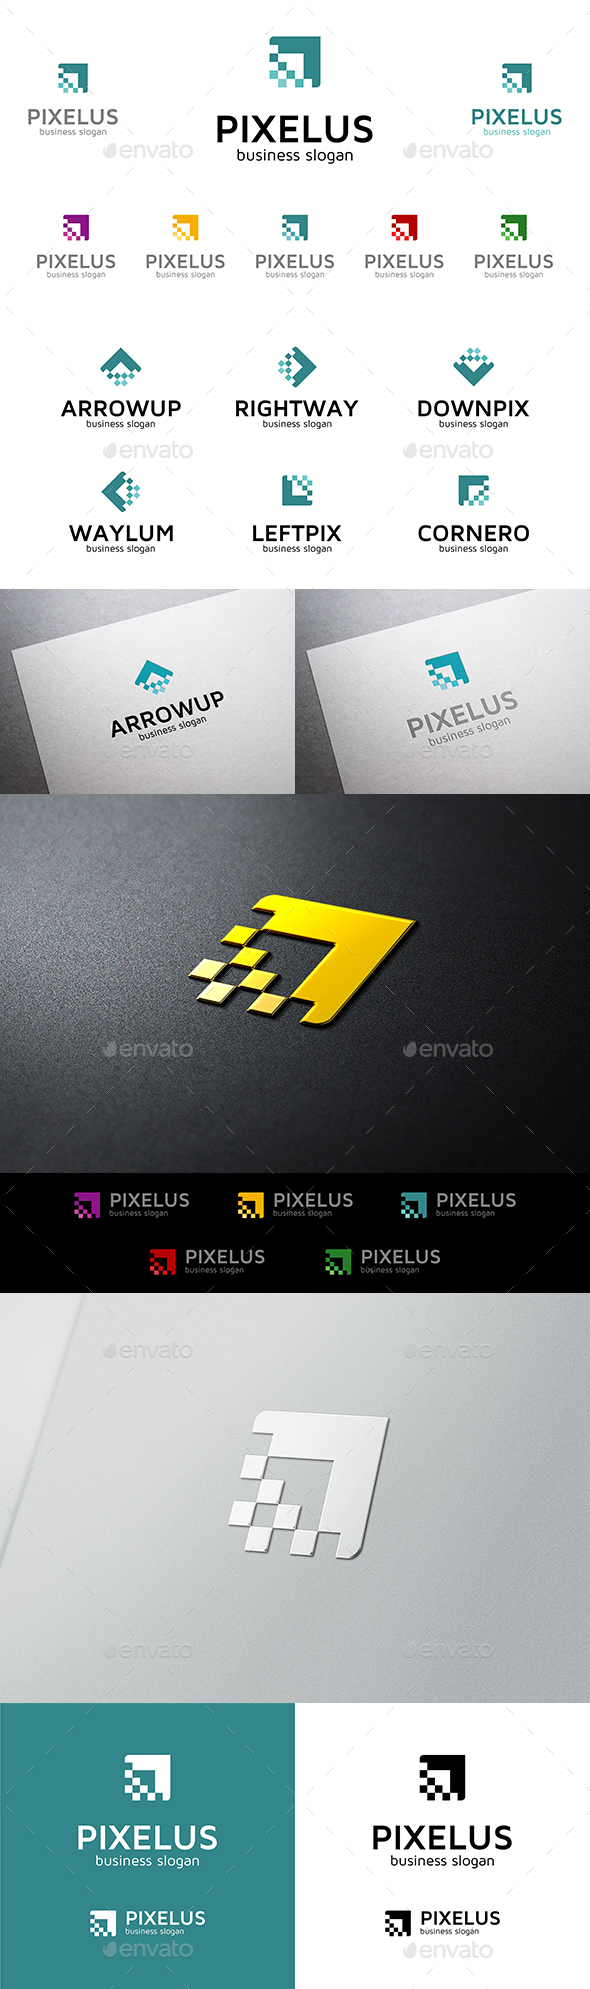 Pixelus Pixel Arrow Vector Multipurpose Logo Template for Business